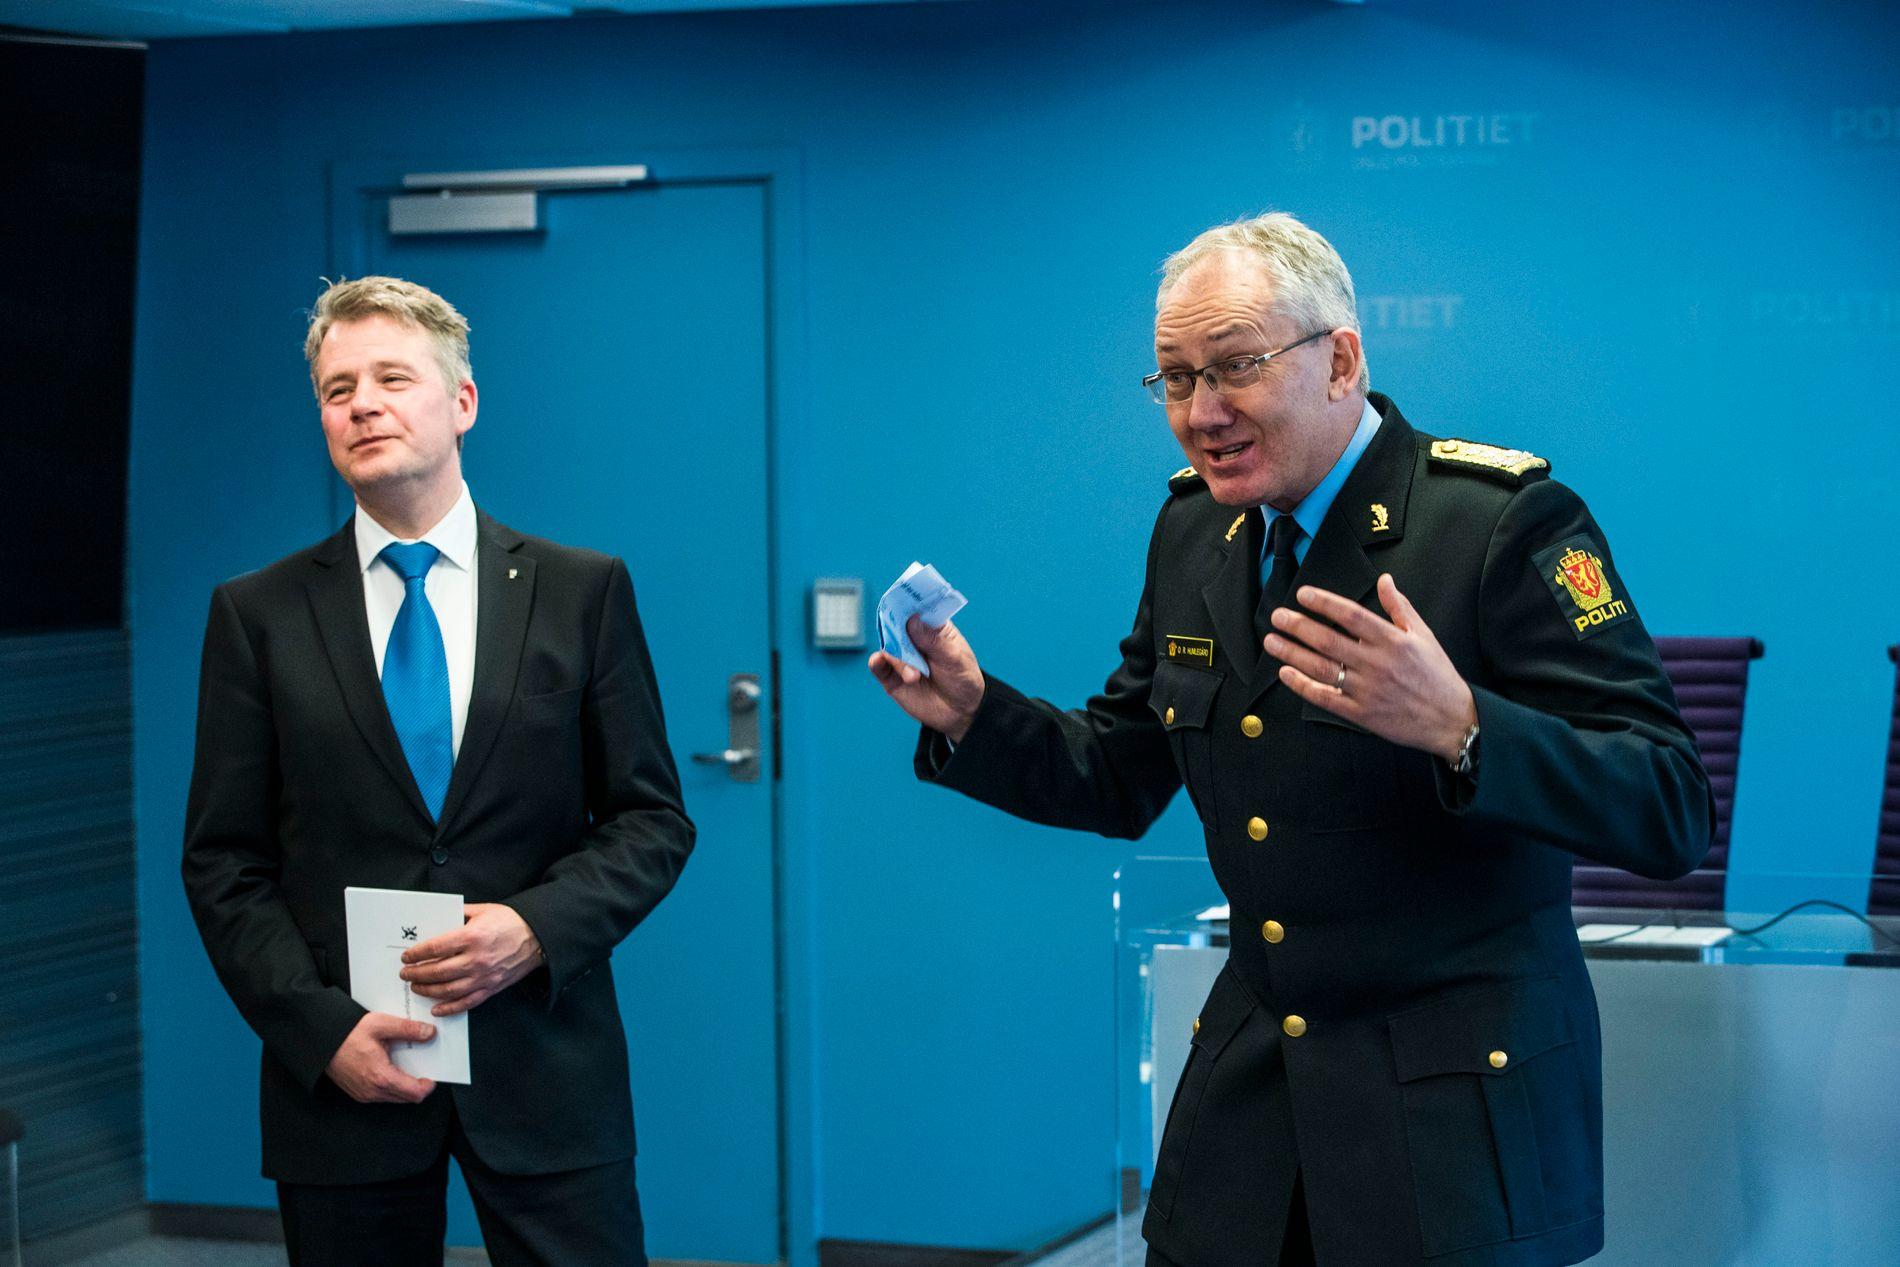 MILLIONER: Politidirektør Odd Reidar Humlegårds direktorat har vokst kraftig under den blåblå regjeringen. Her sammen med justis- og beredskapsminister Per-Willy Amundsen (t.h).